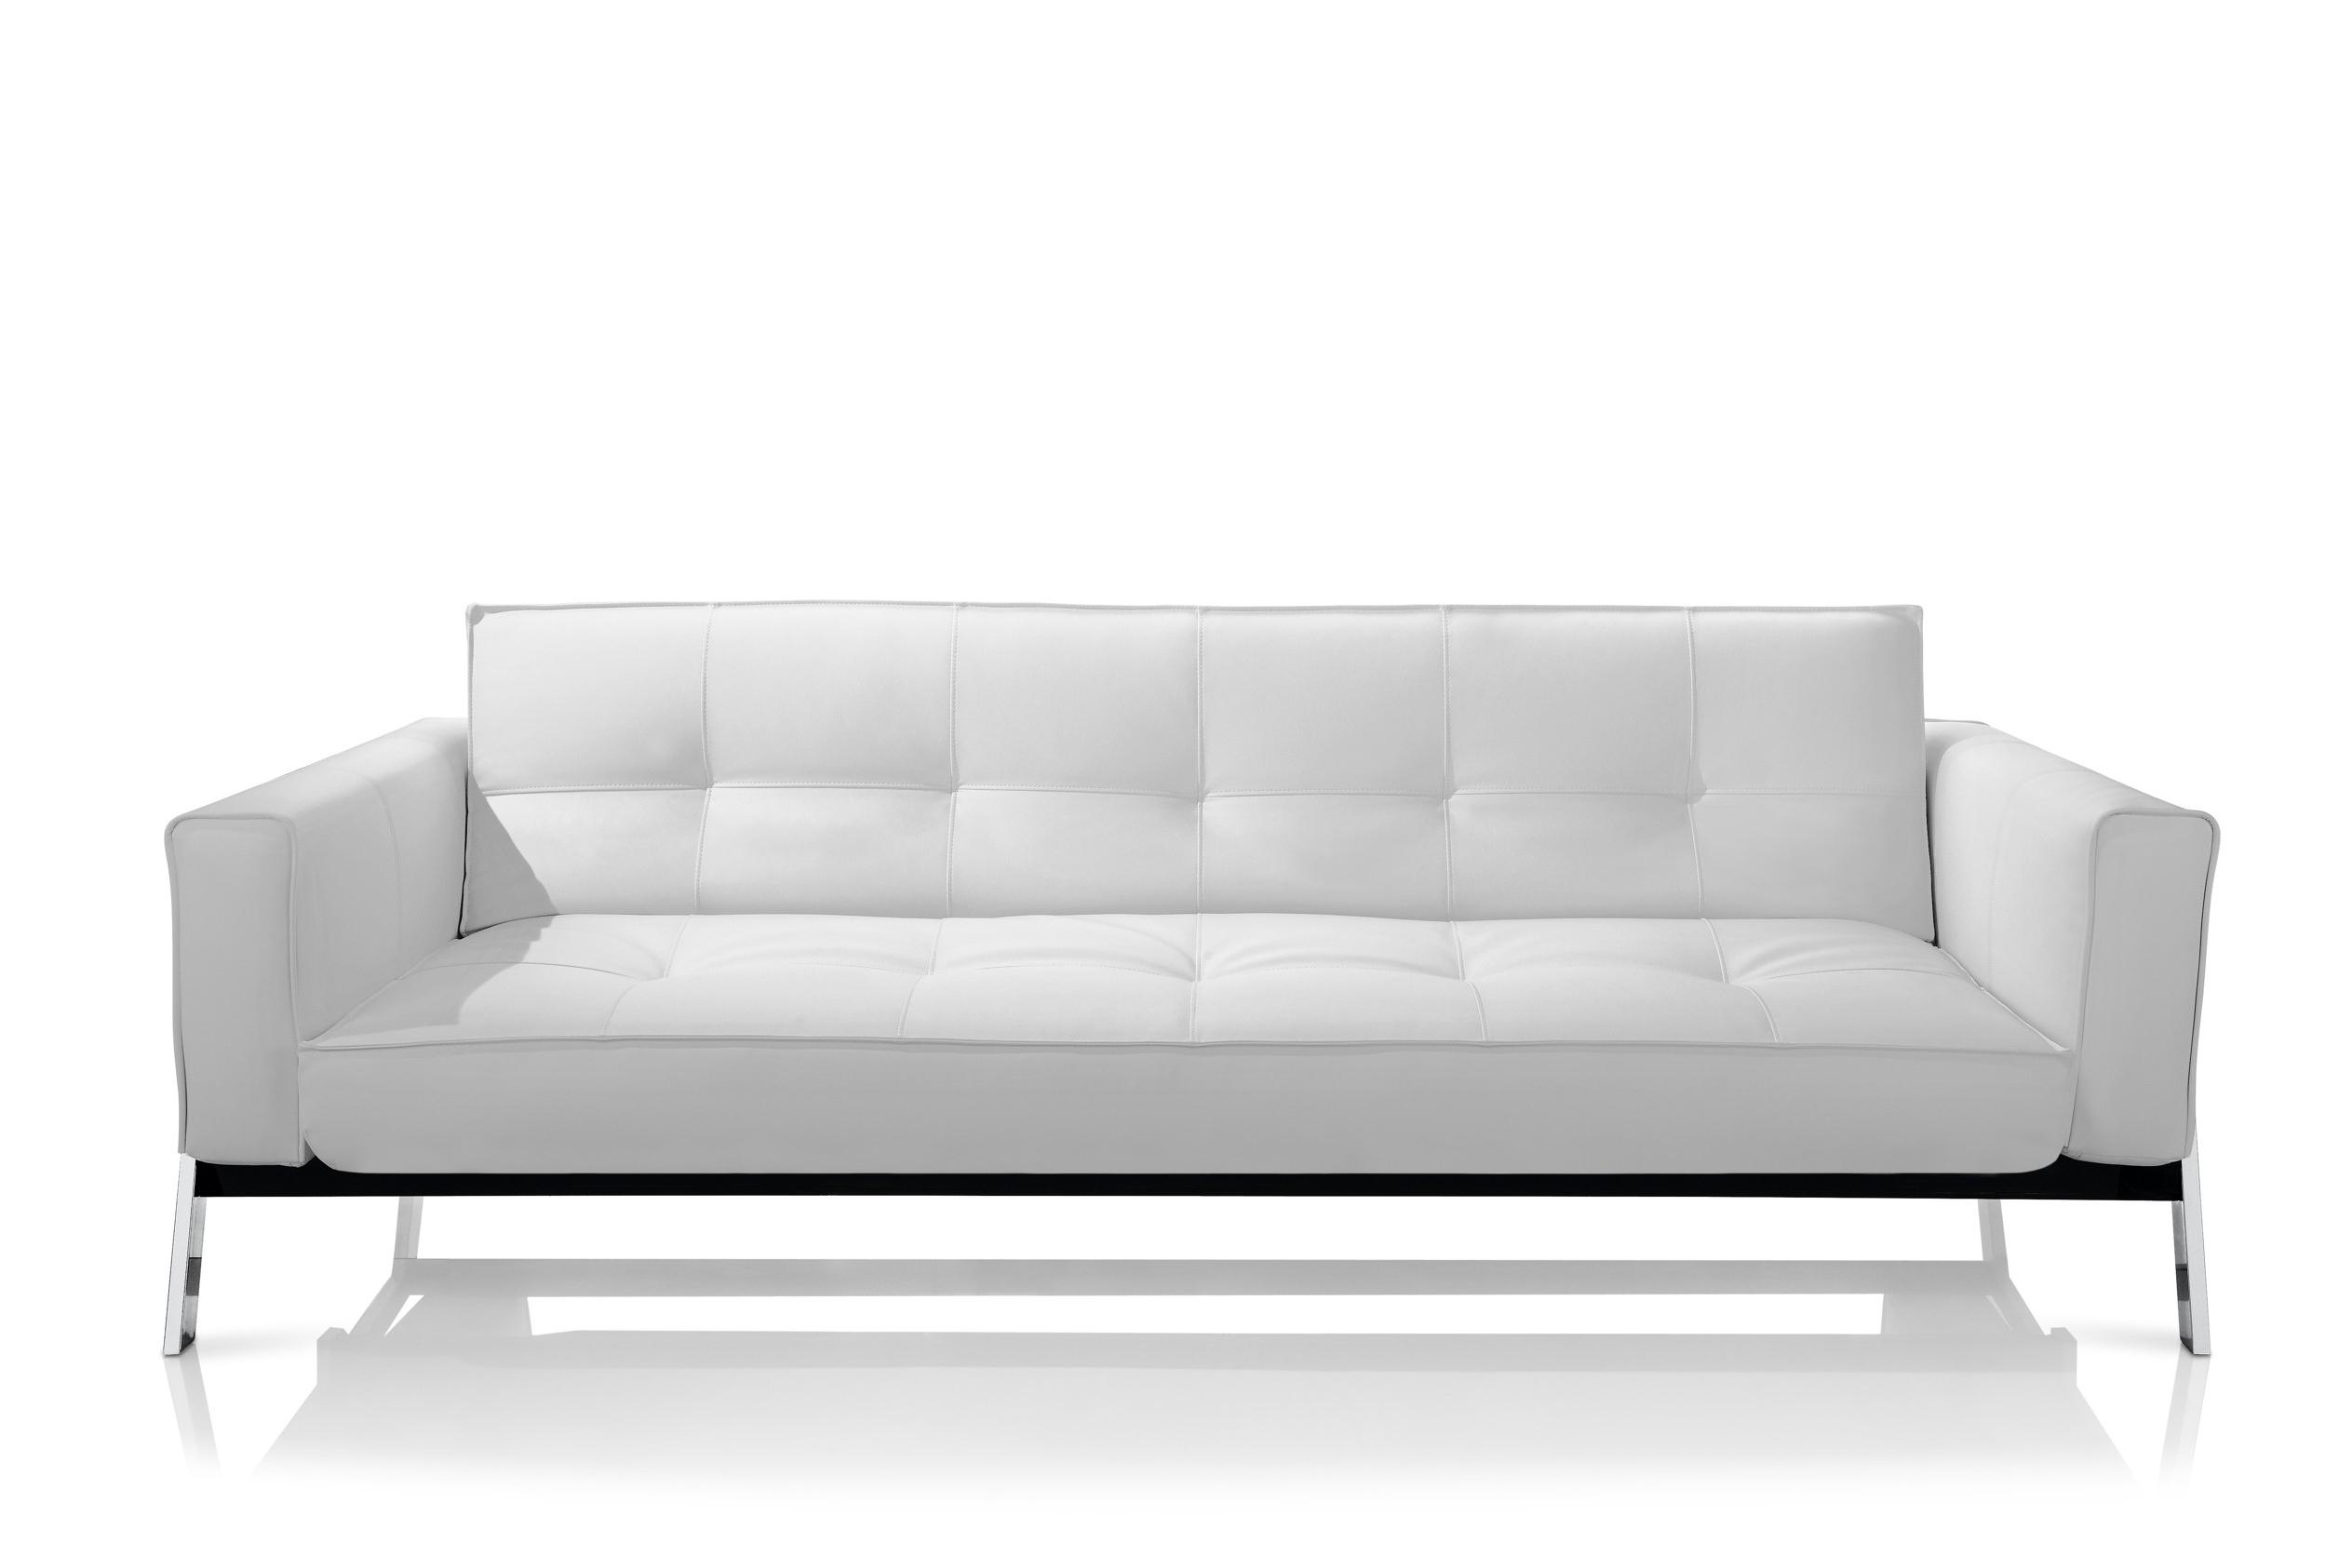 Long Modern Sofas Throughout Trendy Sofa (View 4 of 15)